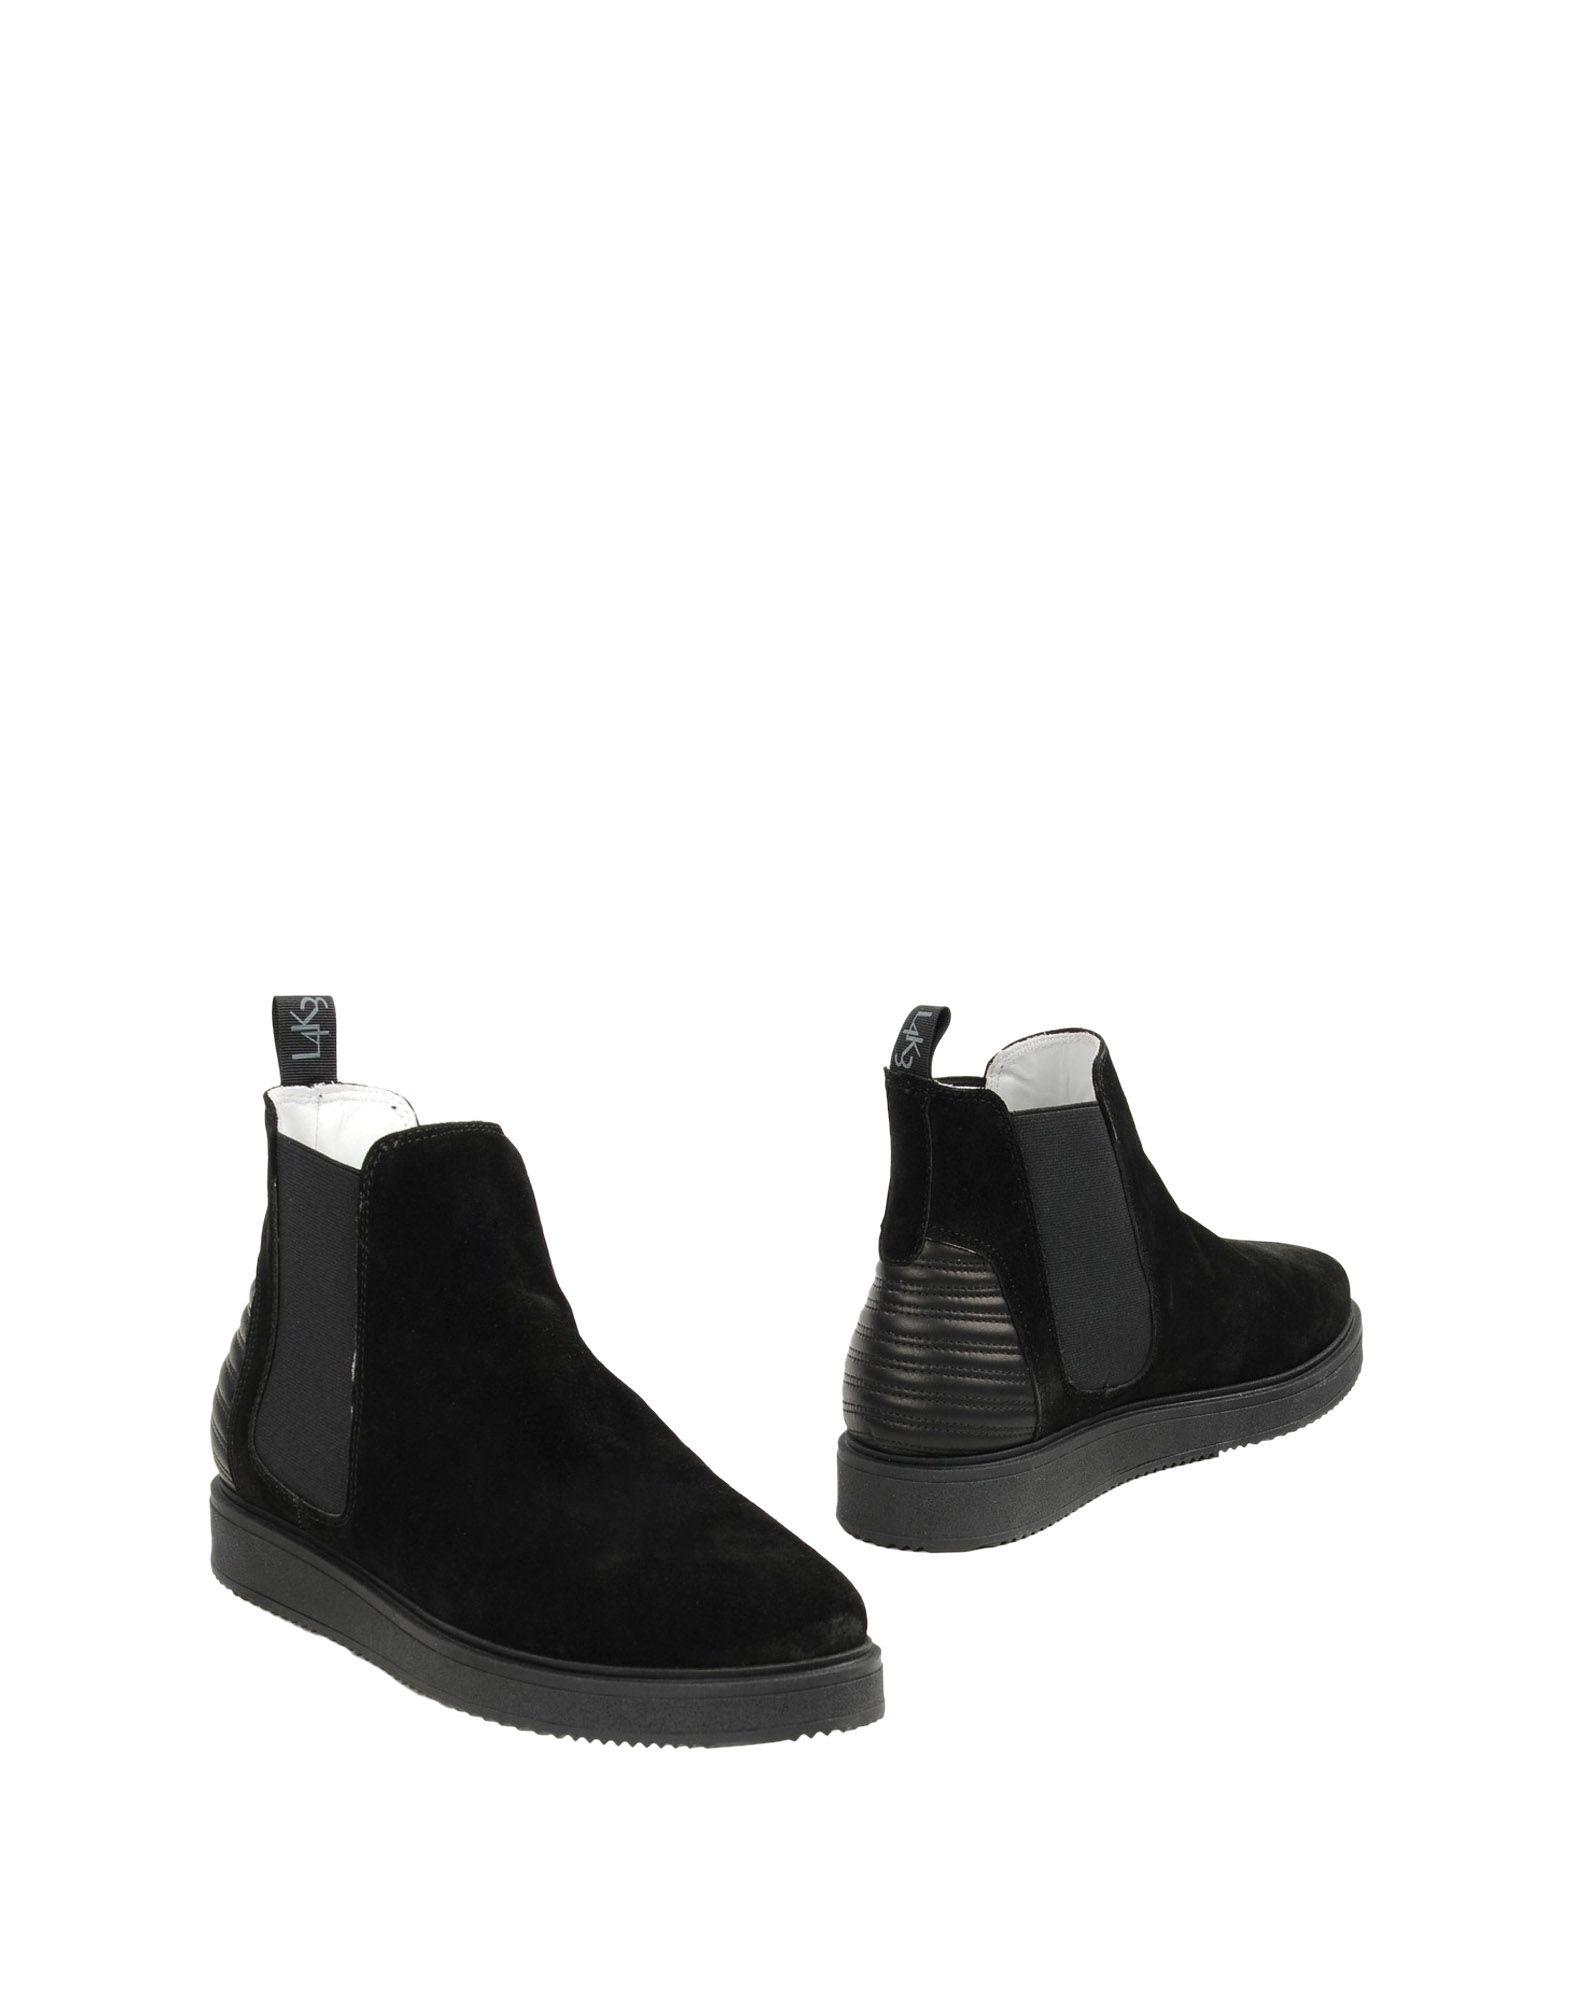 L4k3 Chelsea Boots Damen  11335014UO Gute Qualität beliebte Schuhe